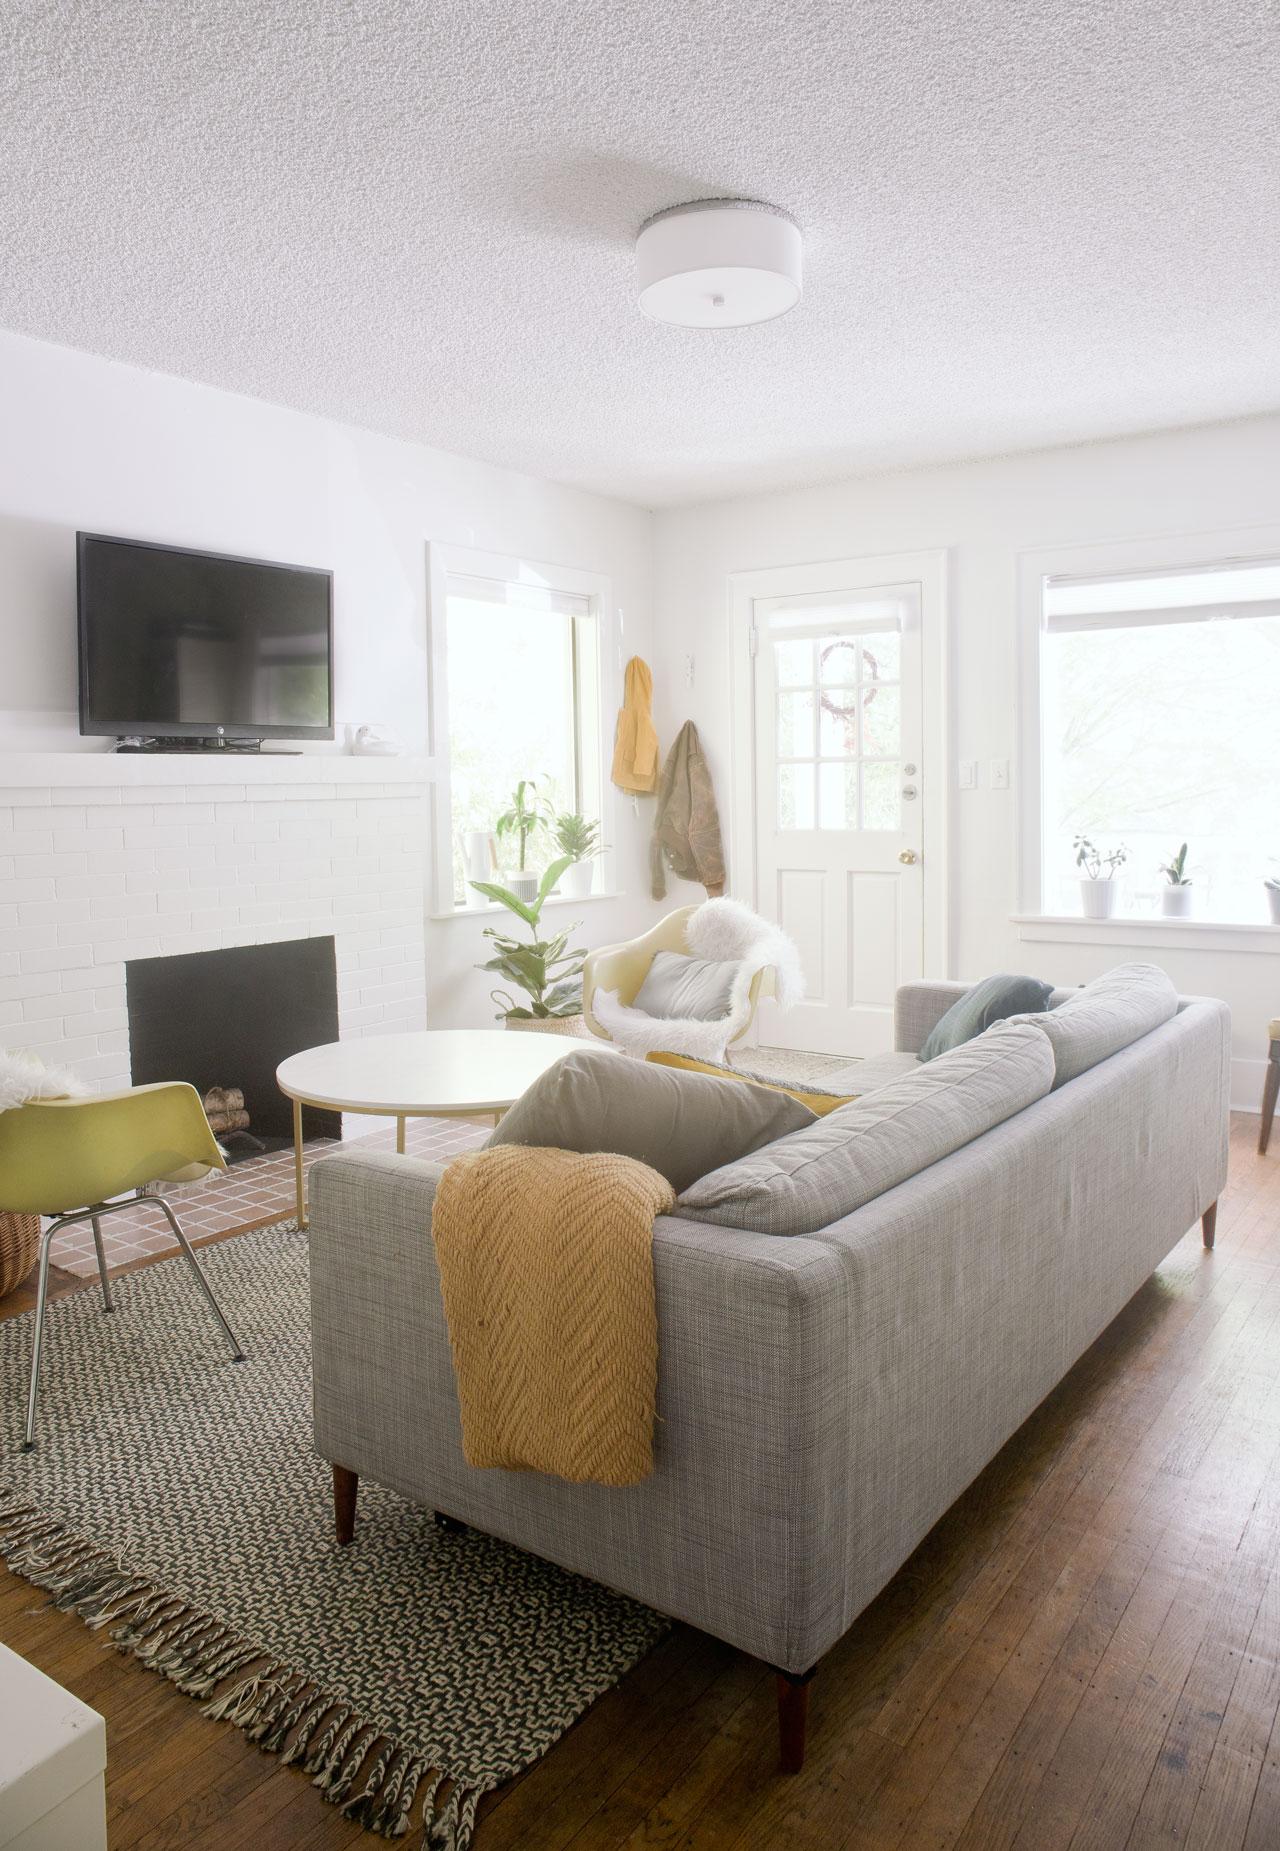 House-Tour-Living-Room-1